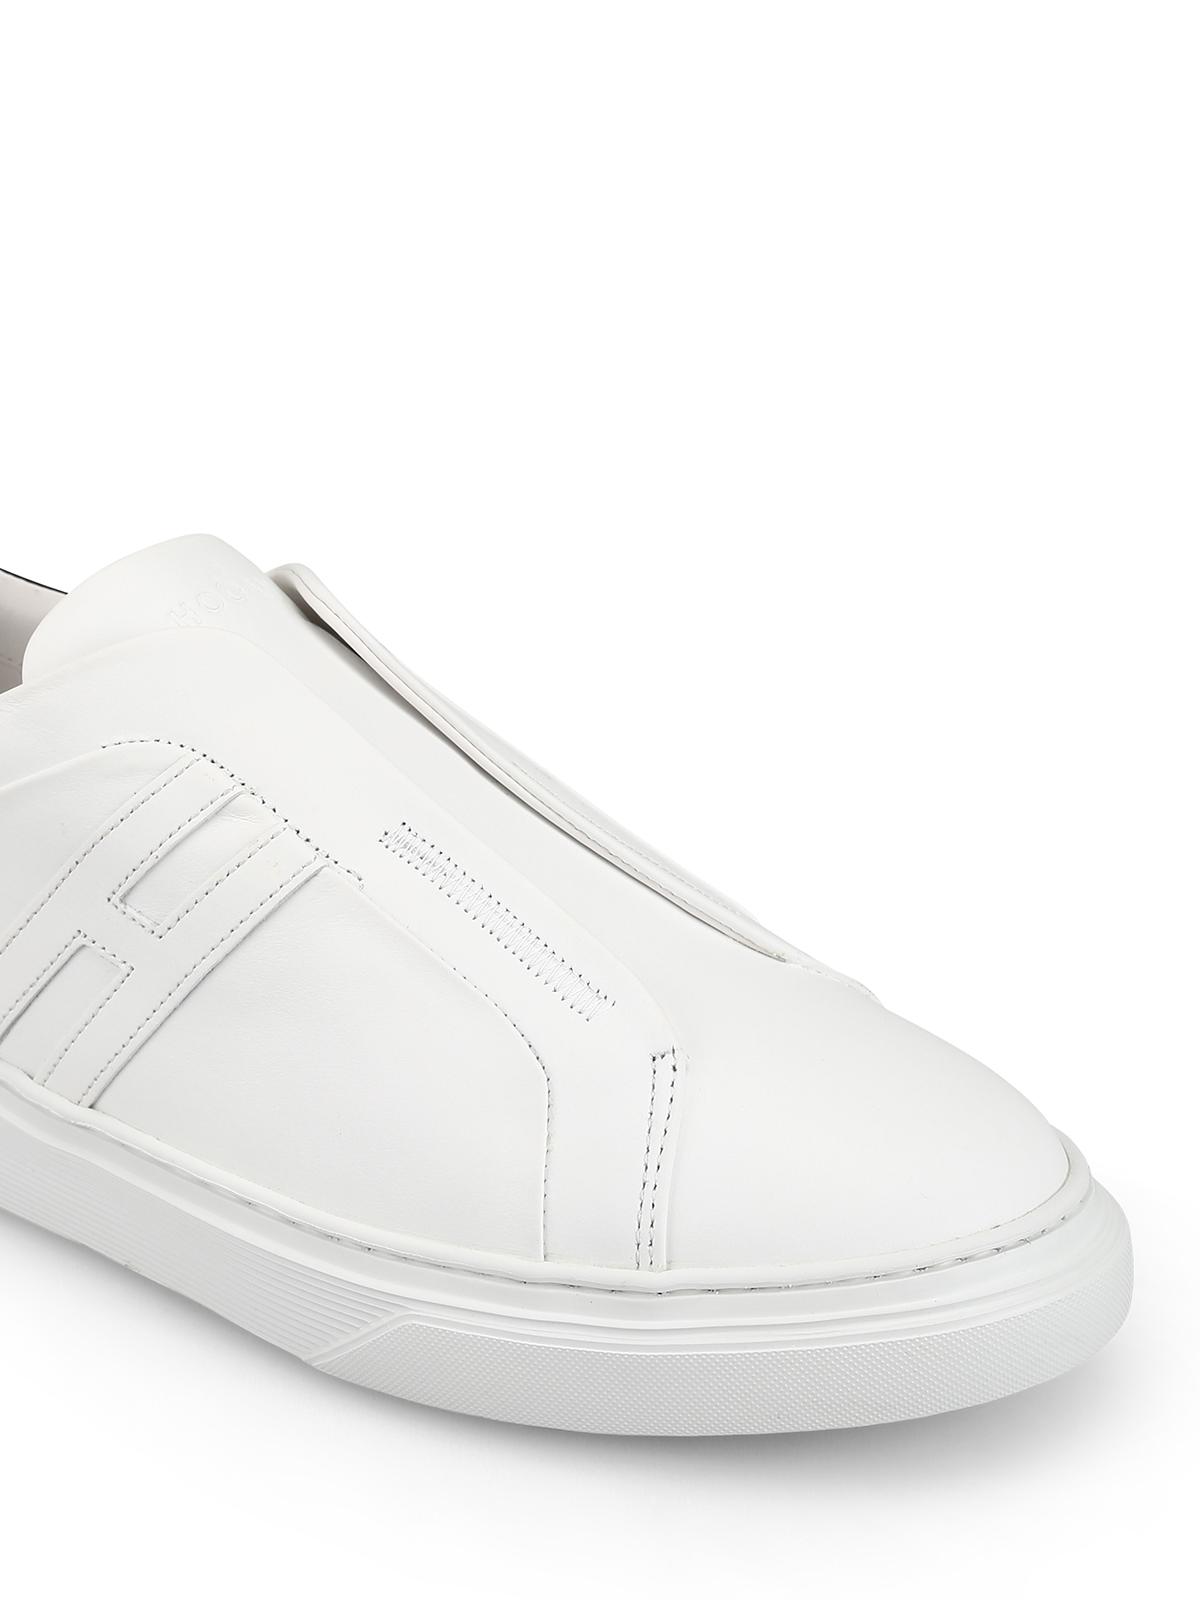 Trainers Hogan - H365 white leather slip-ons - HXM3650BE00KFM0001